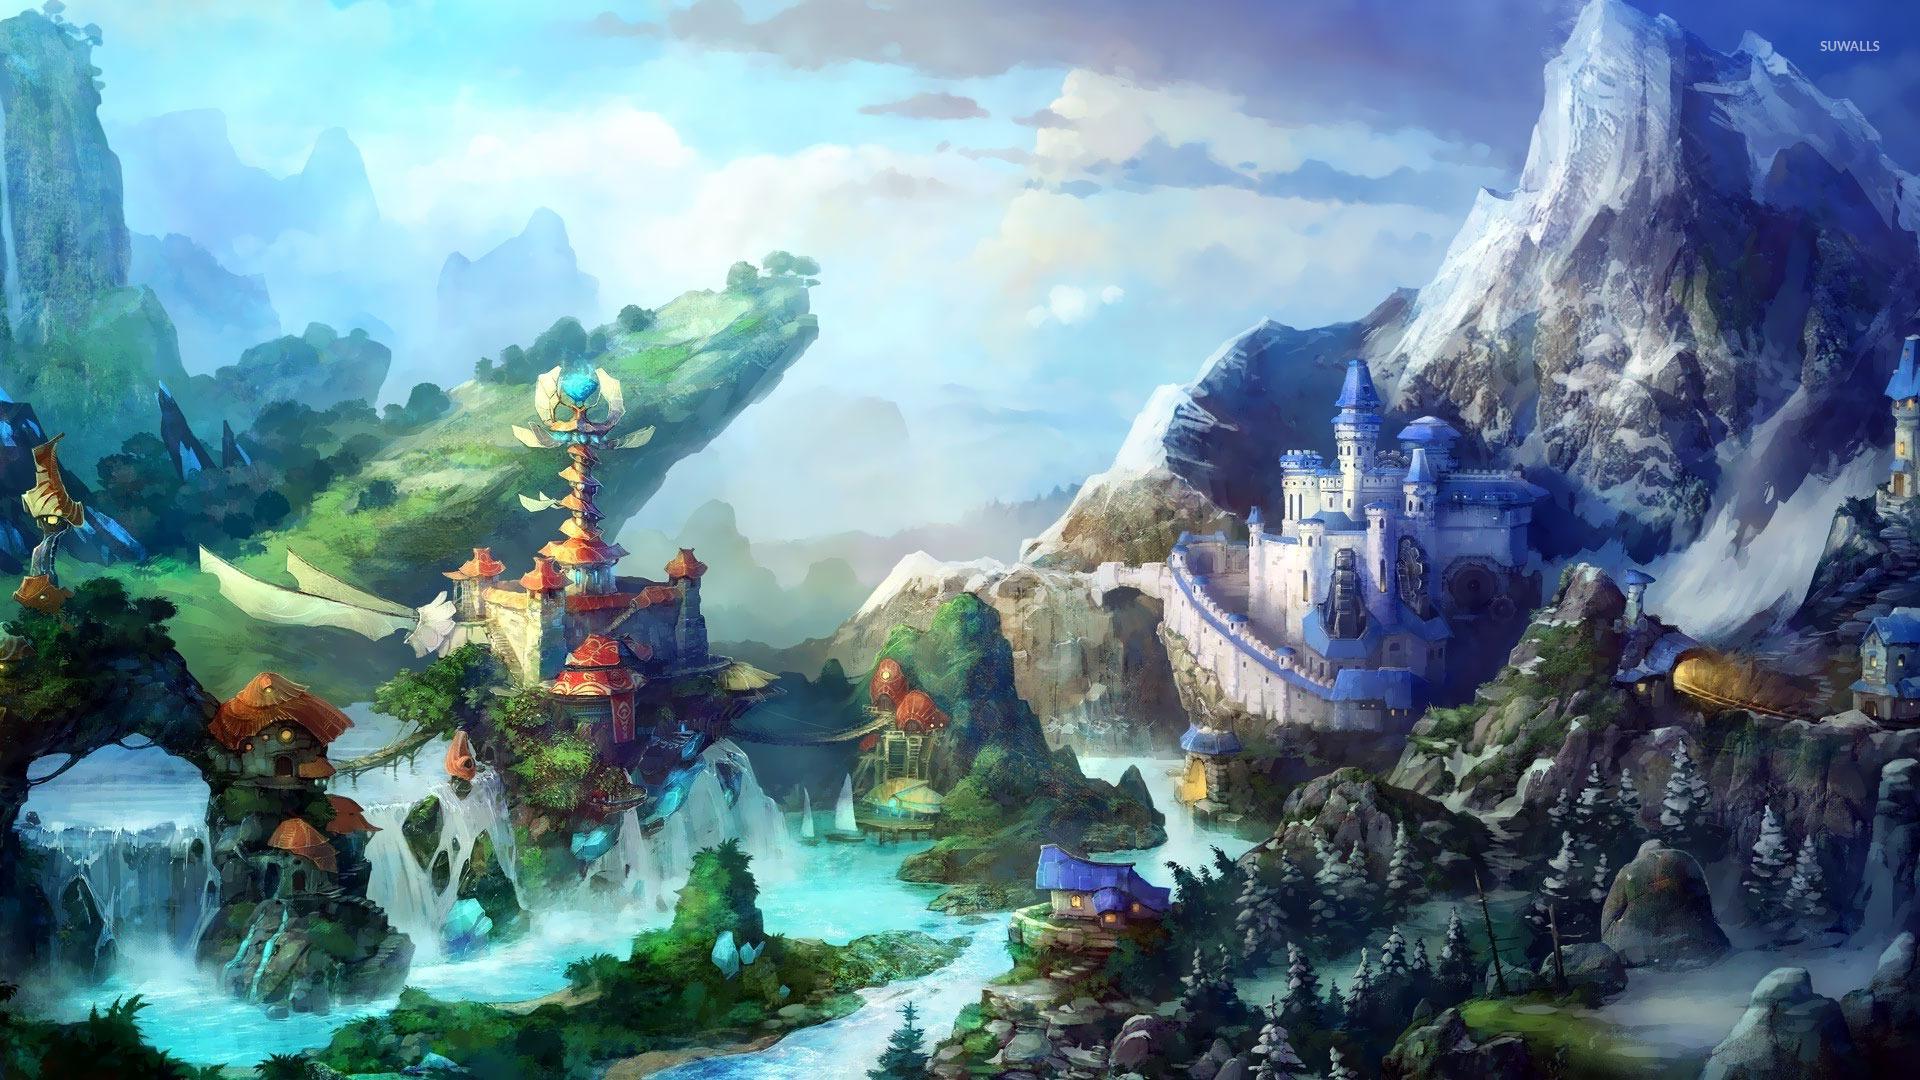 Waterfall city wallpaper fantasy wallpapers 18626 waterfall city wallpaper voltagebd Gallery